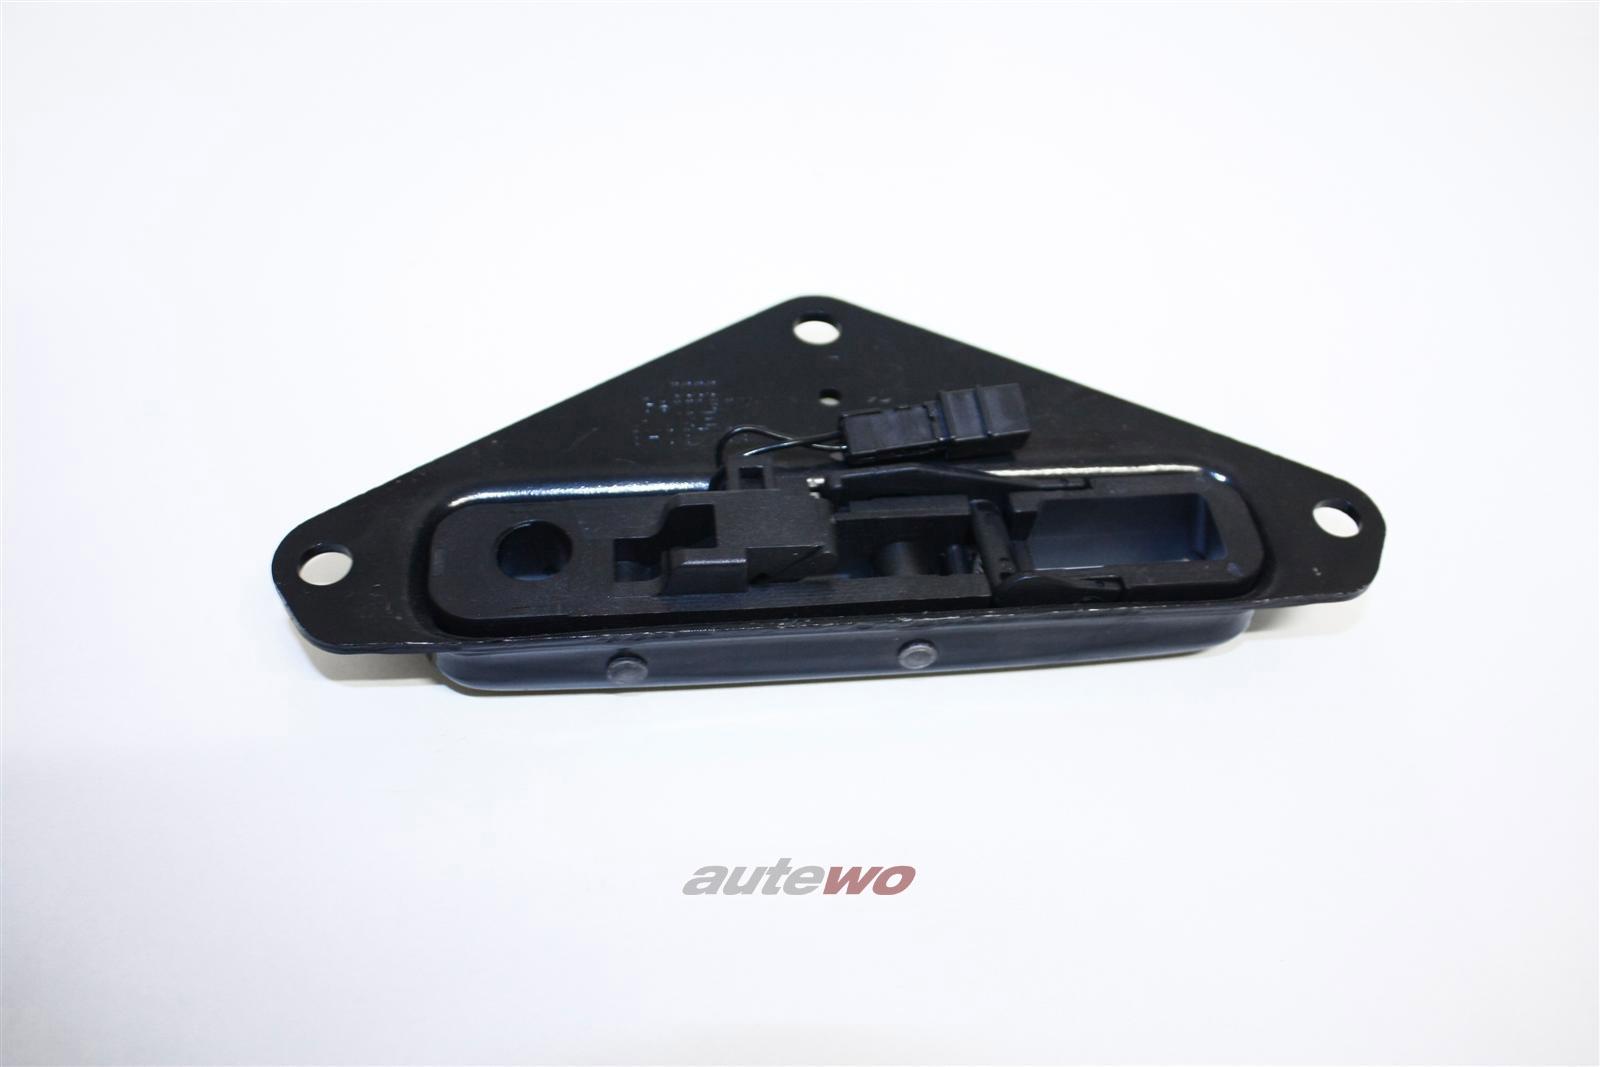 NEU! Audi A4/S4/RS4 Cabrio Verdeckverschluss Unterteil + Kontaktschalter Links 8H0871397